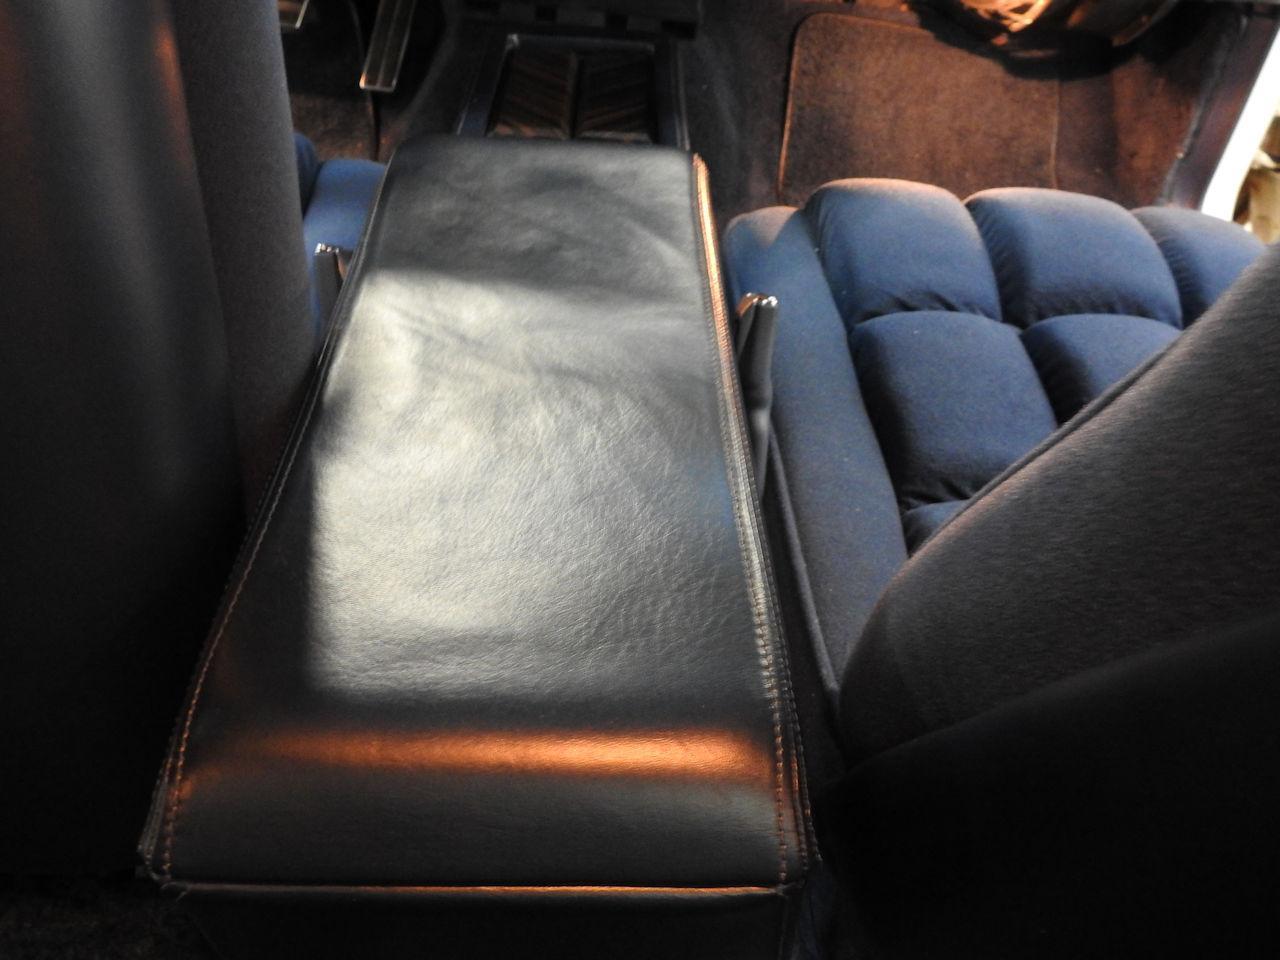 1979 Lincoln MKV 67